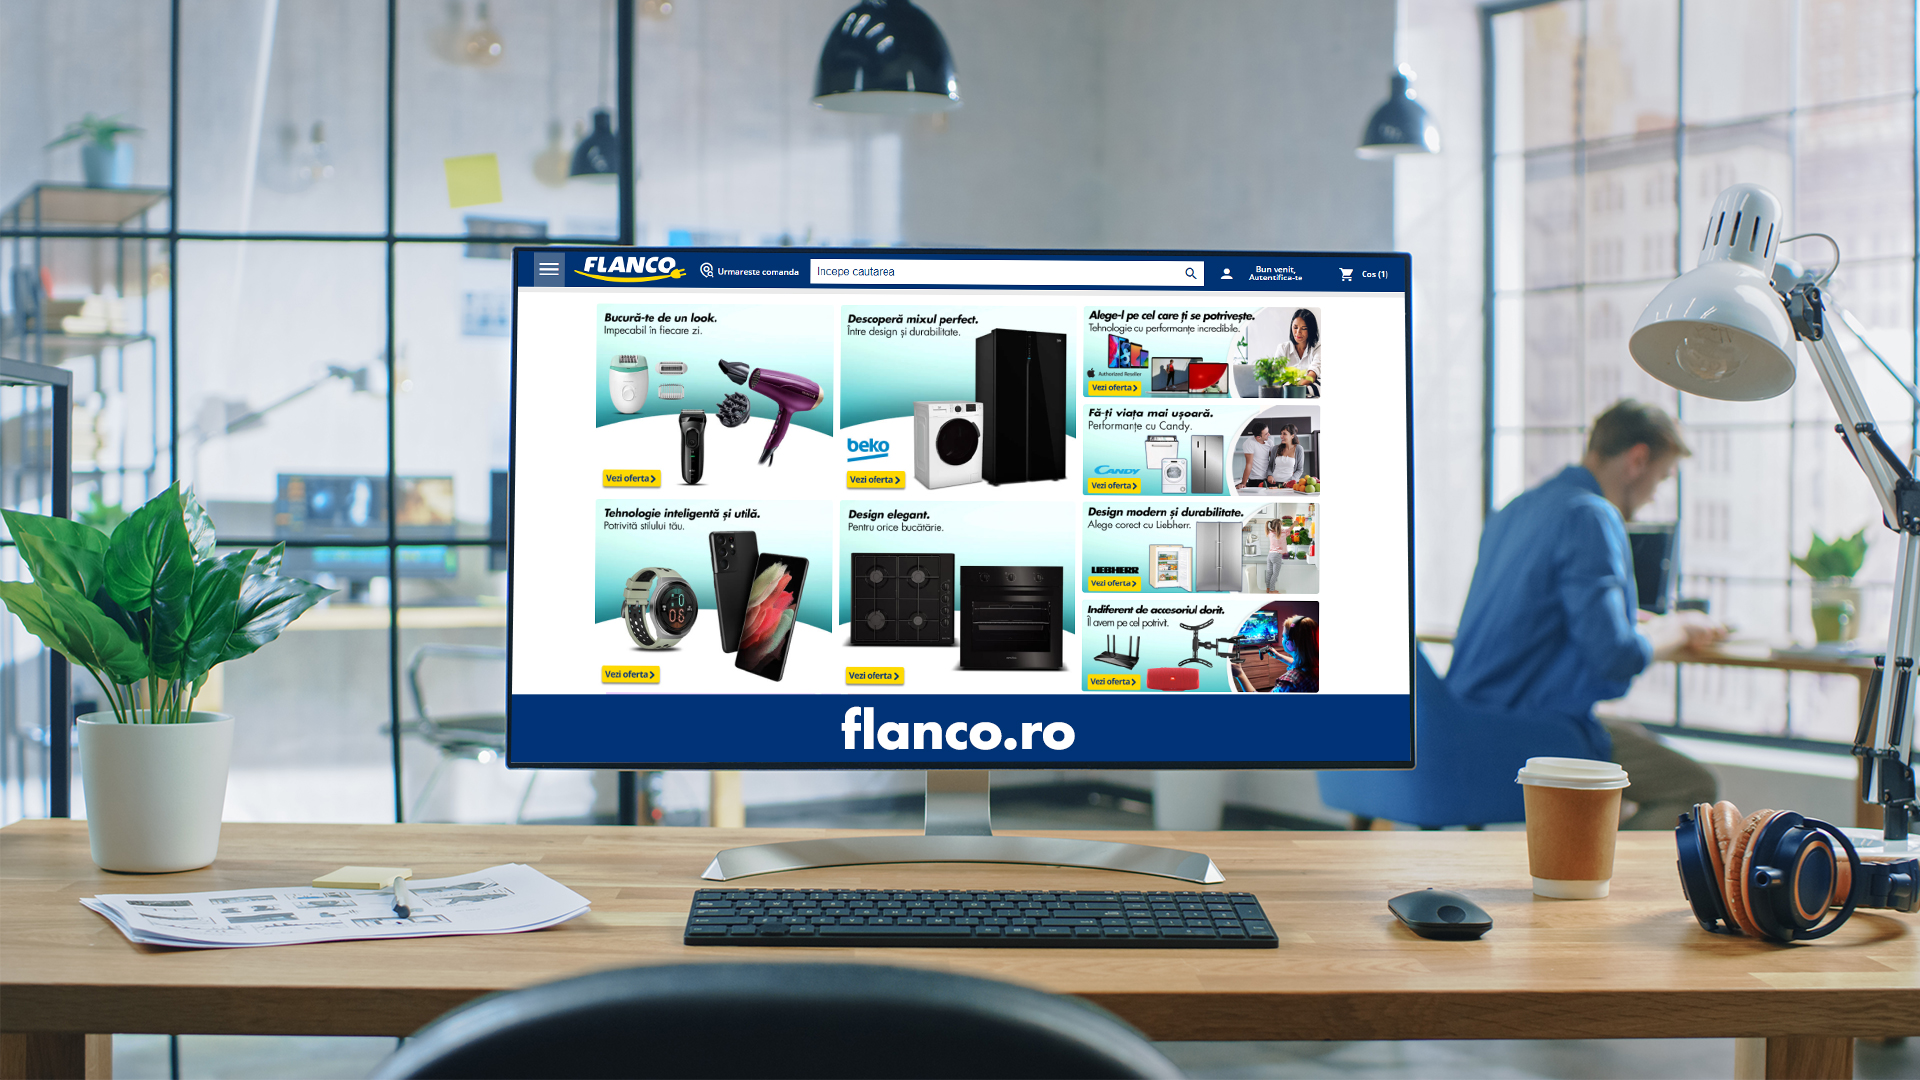 digitalizarea flanco